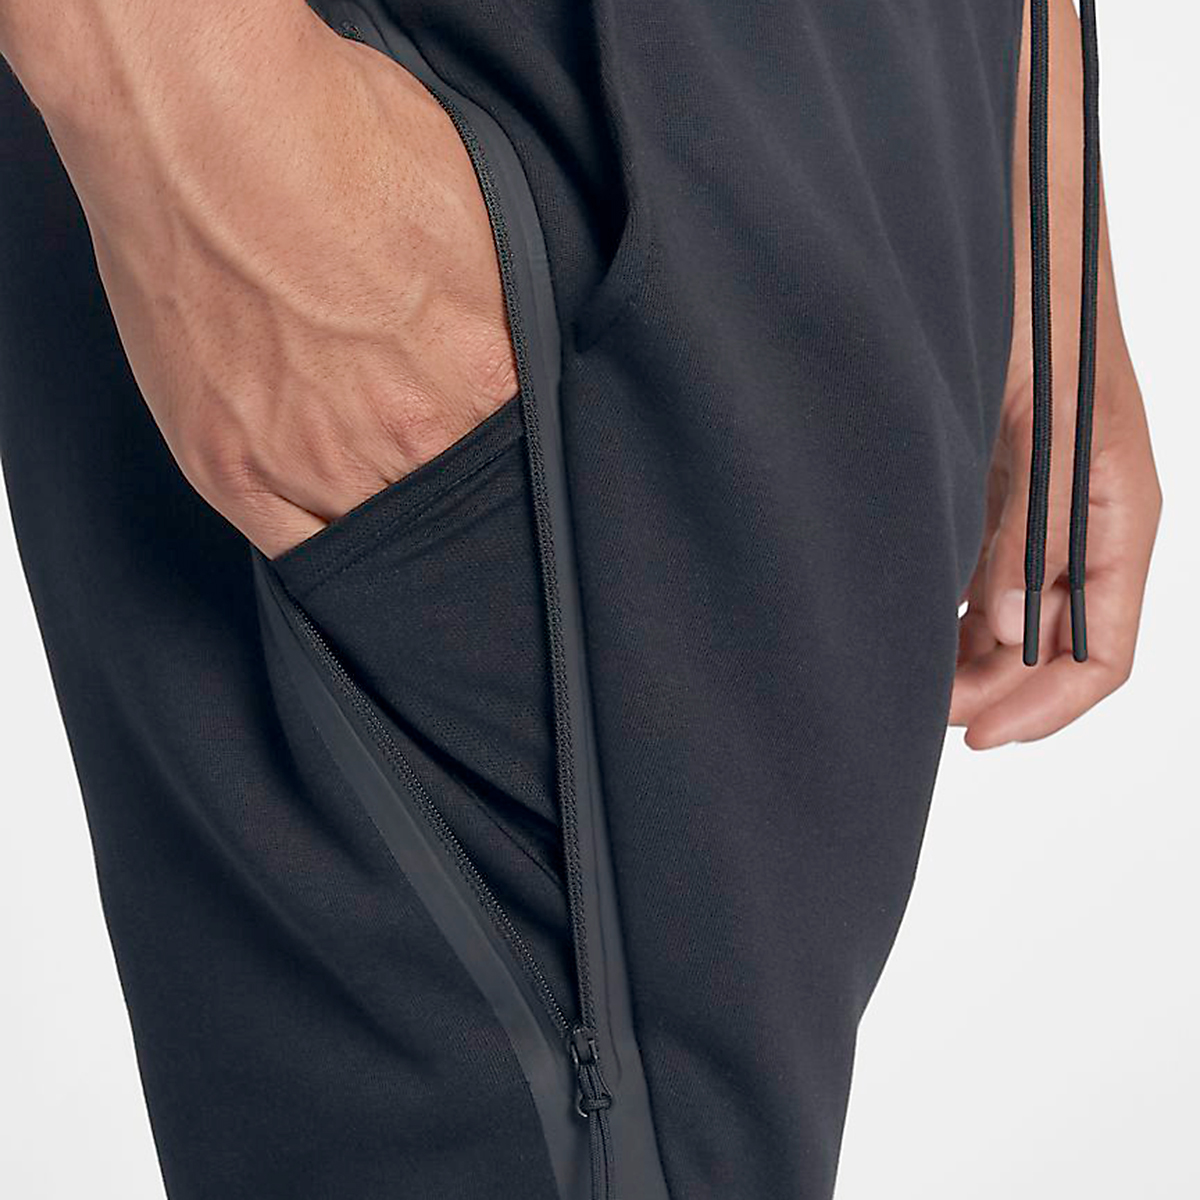 Men's Nike Tech Fleece Jogger  - Color: Black - Size: S, Black, large, image 3